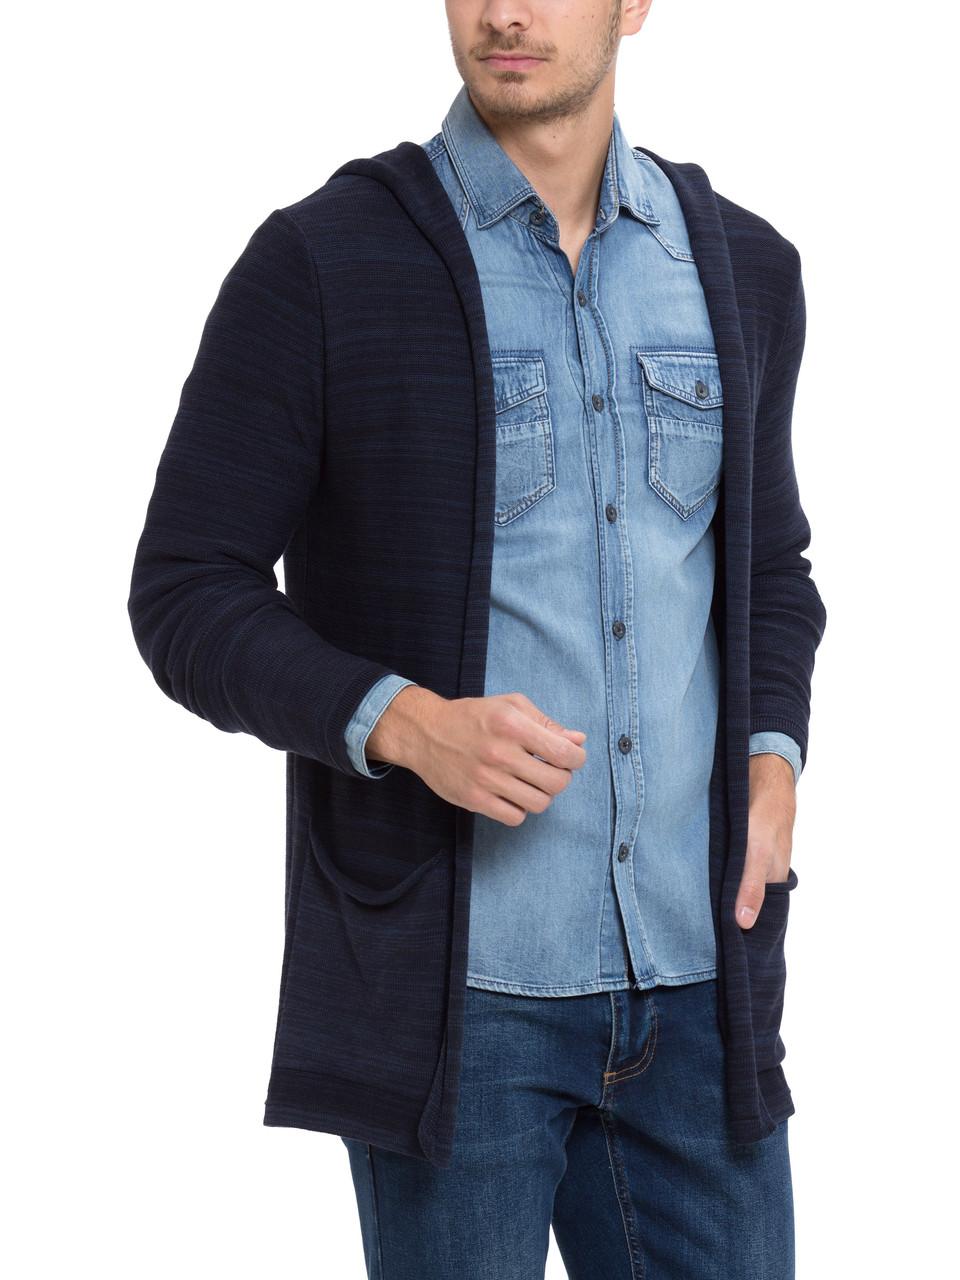 Мужская мантия LC Waikiki / ЛС Вайкики синяя, с накладными карманами и капюшоном